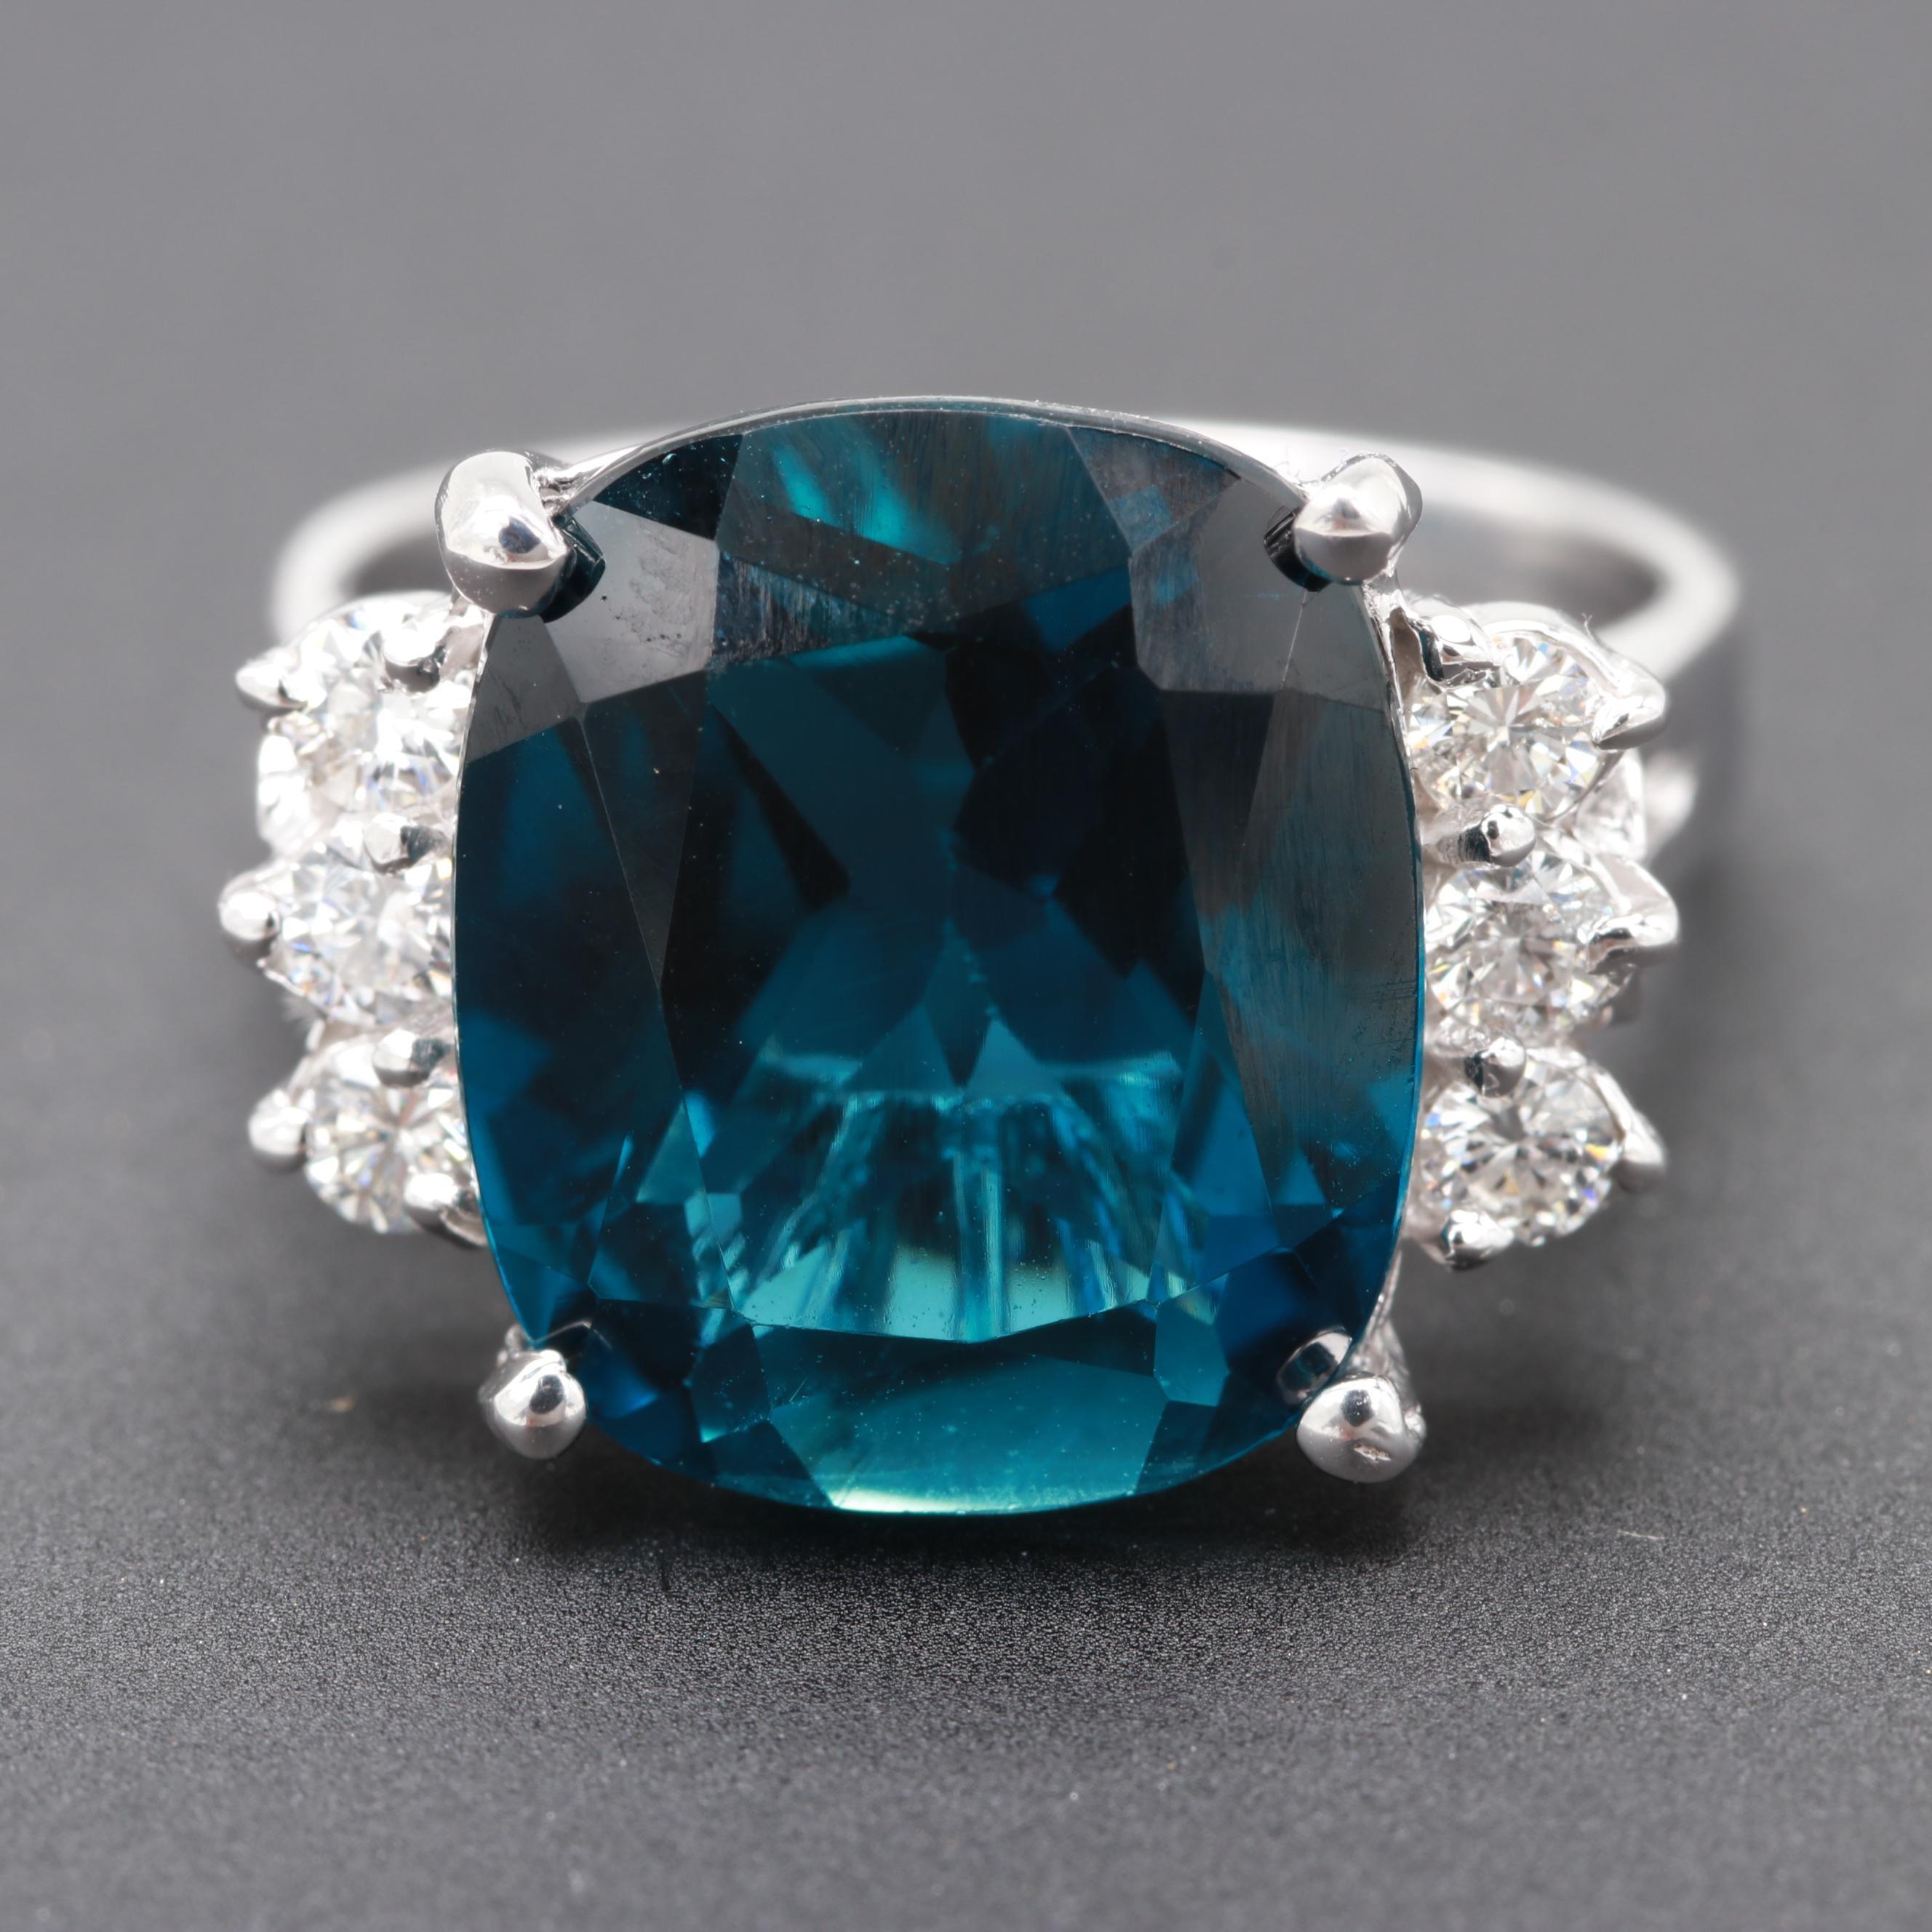 14K White Gold 8.95 CT Blue Topaz and Diamond Ring